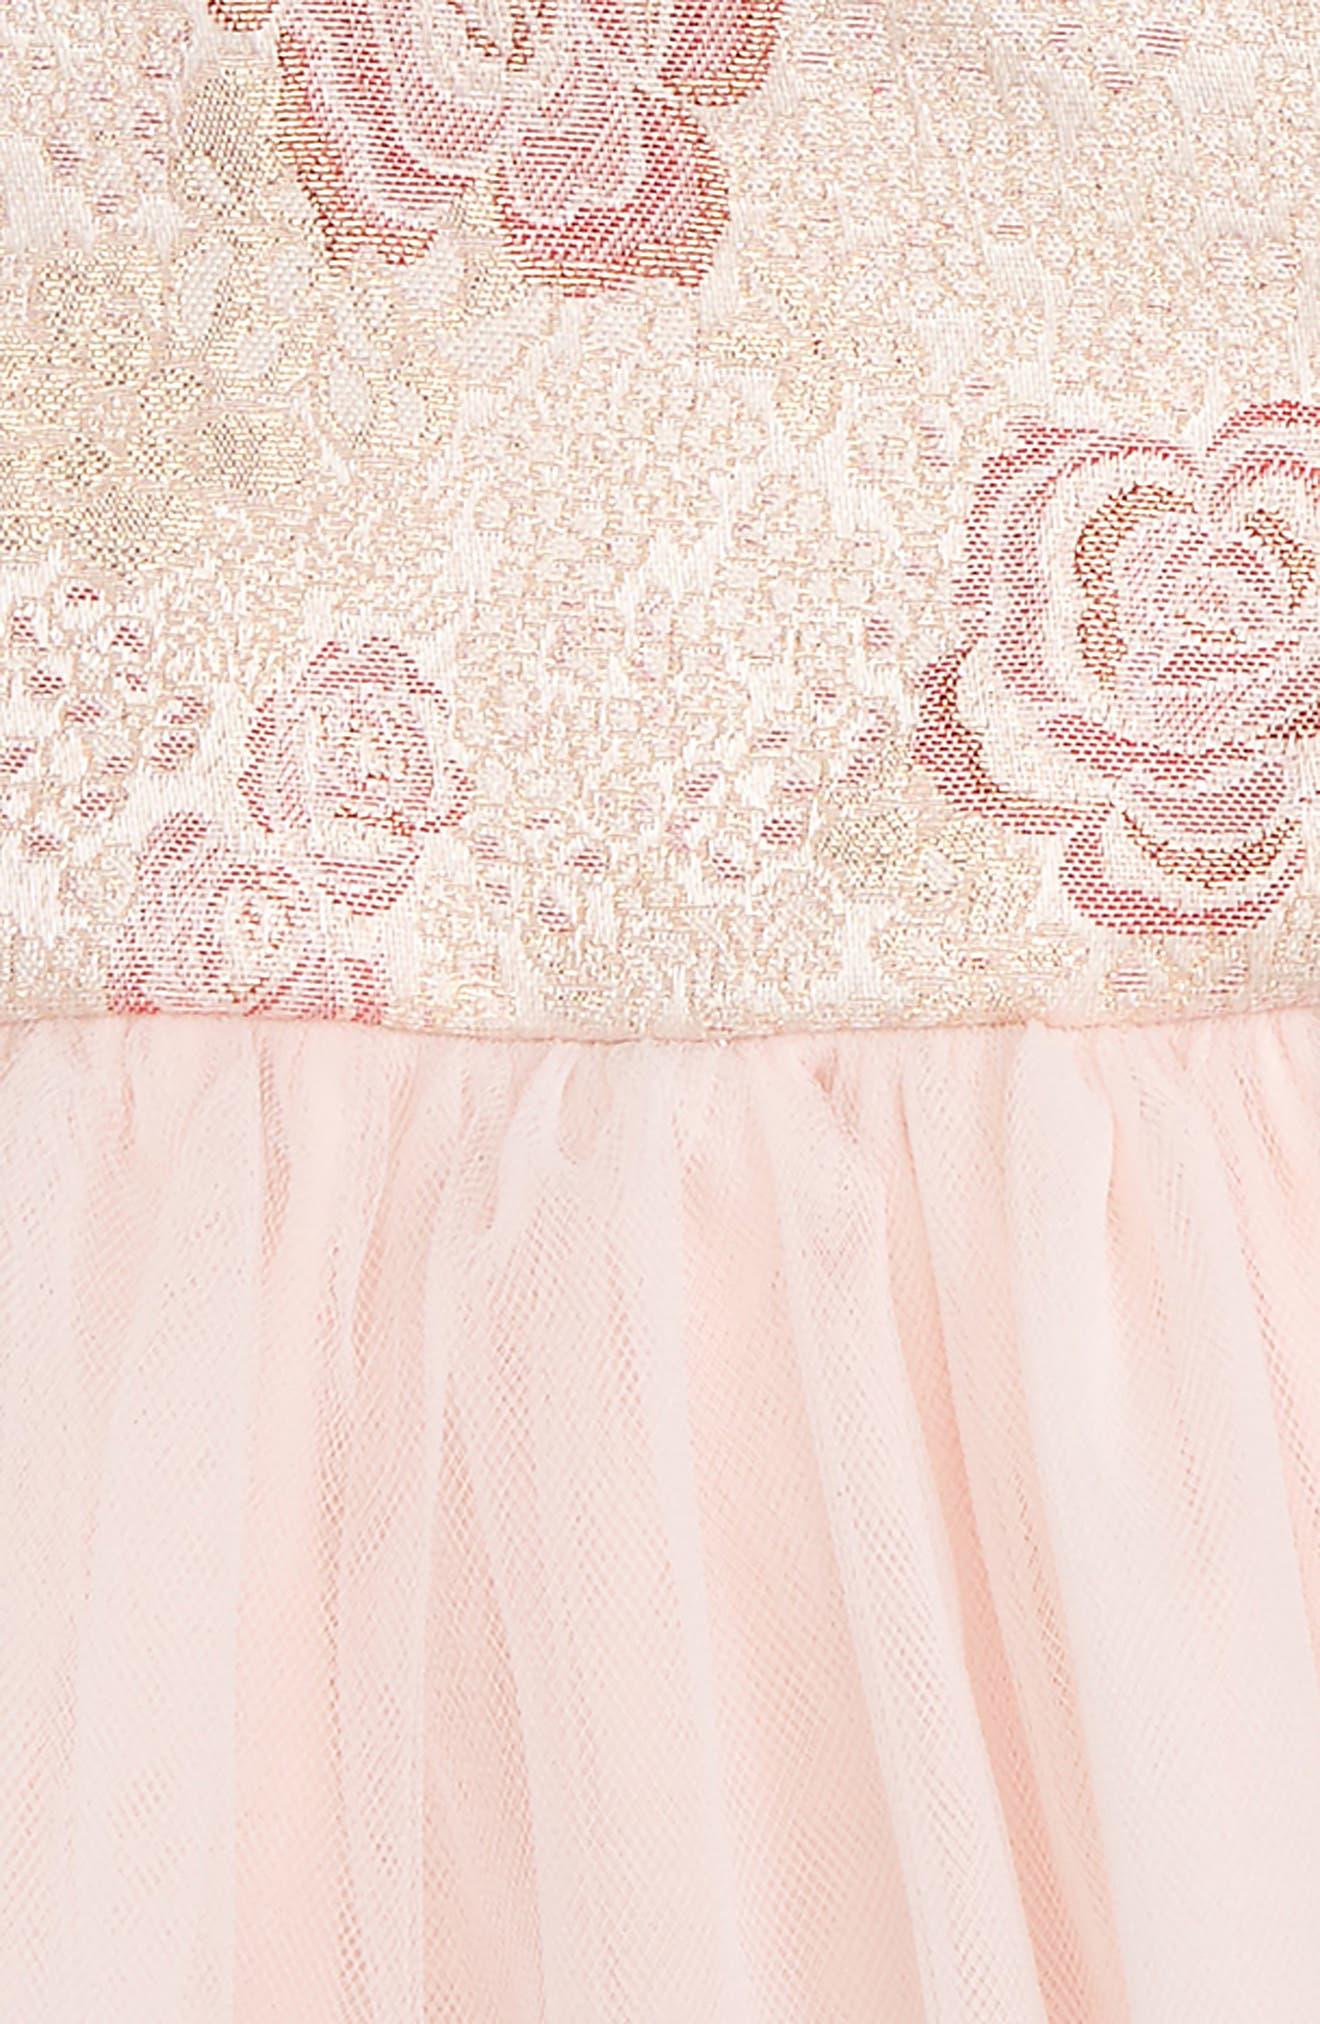 Jacquard Ballerina Party Dress,                             Alternate thumbnail 2, color,                             Light Pink